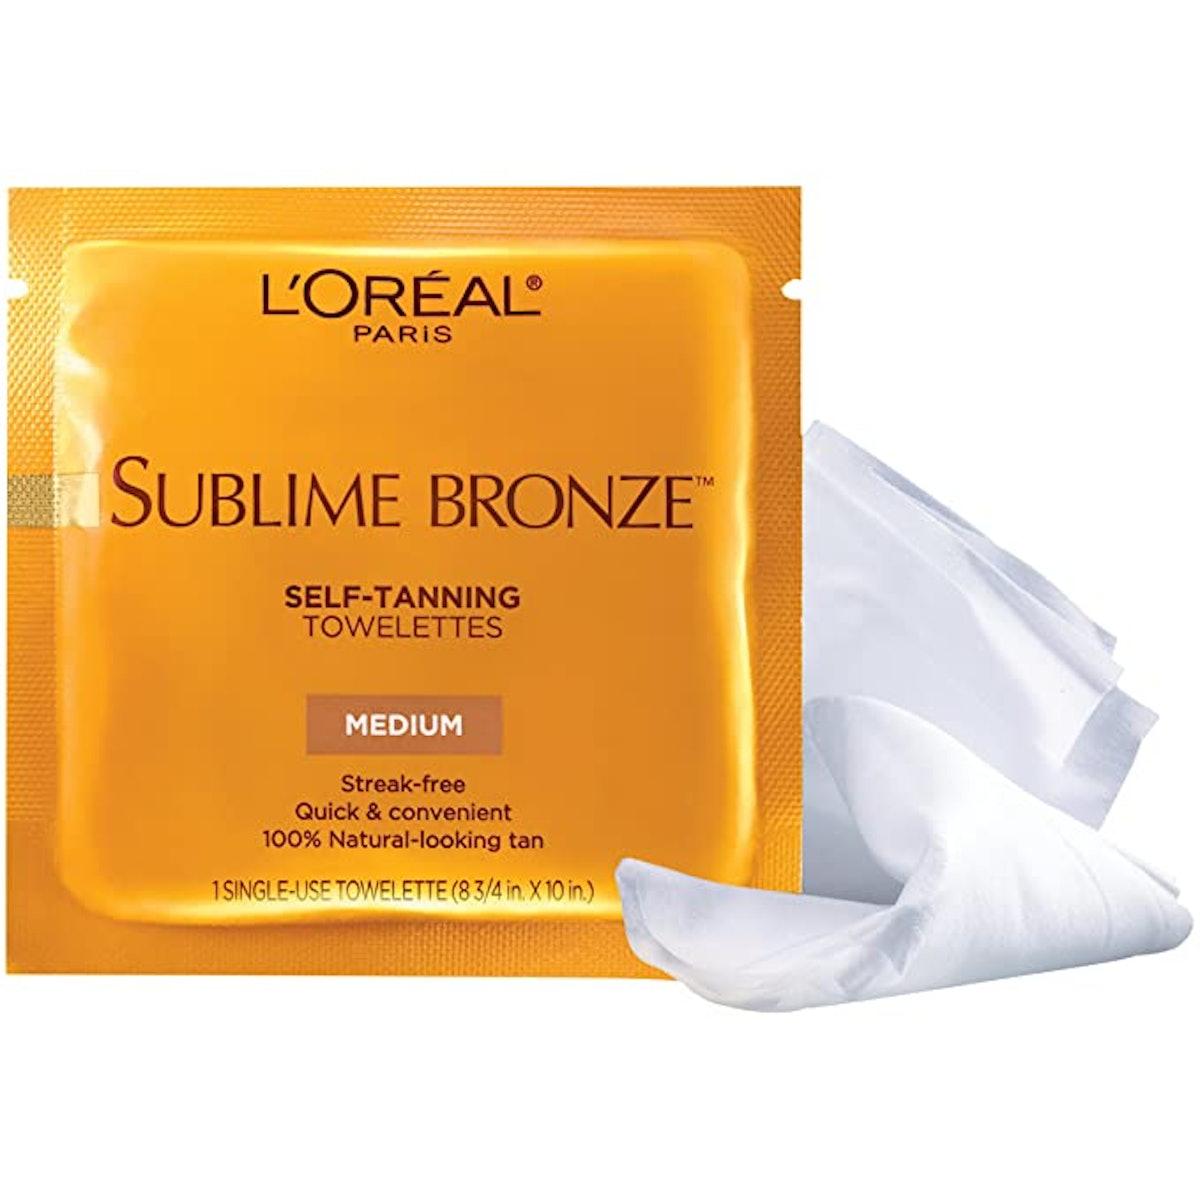 L'Oreal Paris Skincare Sublime Bronze Self-Tanning Towelettes